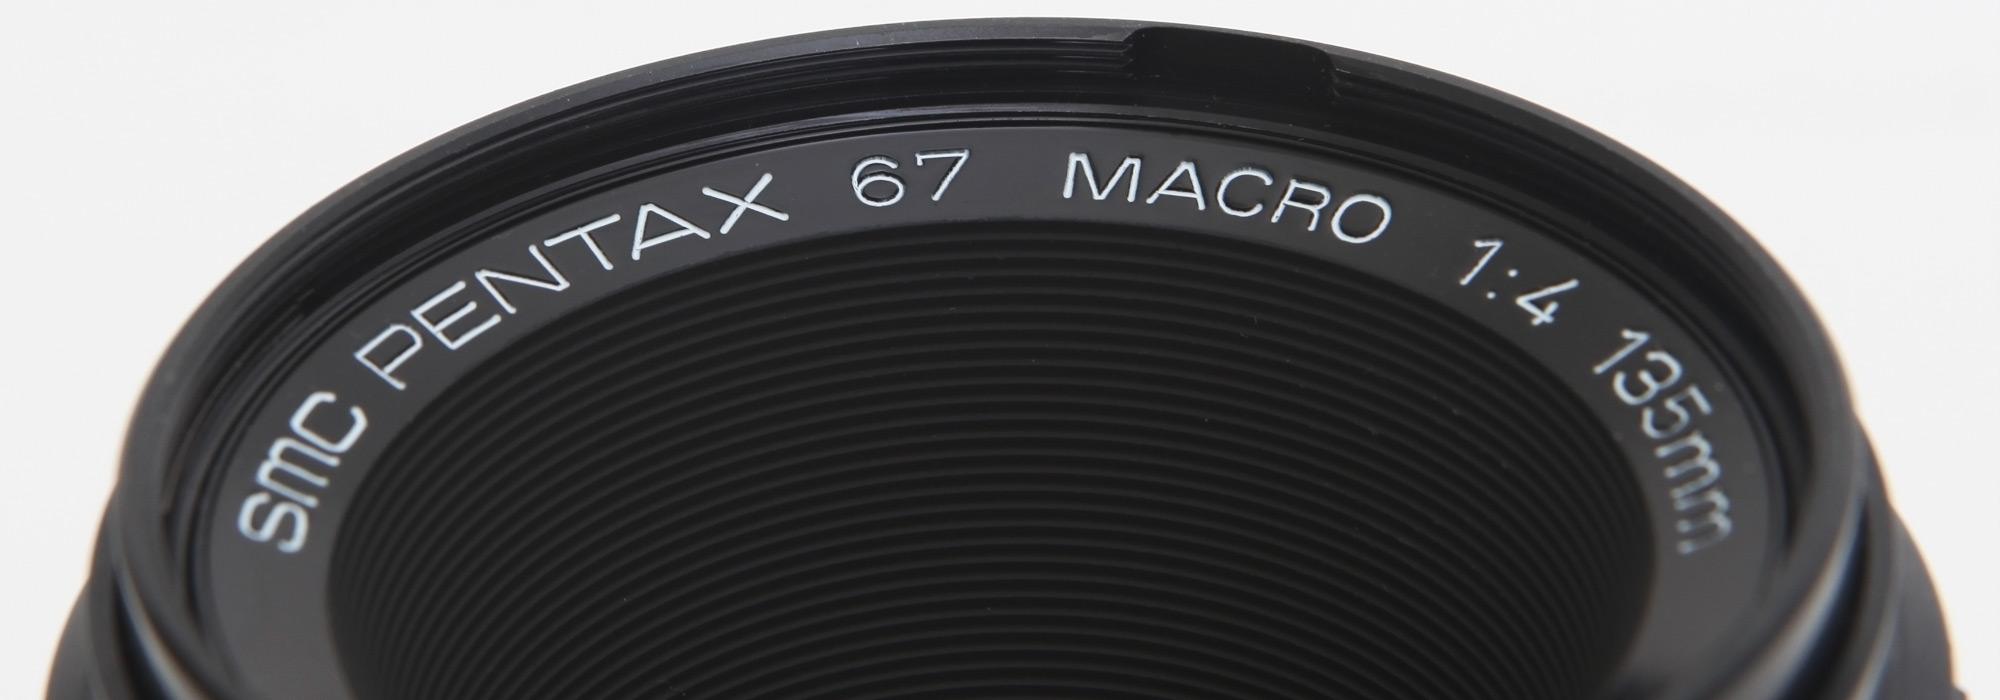 SMC PENTAX 67 MACRO 1:4 135mm